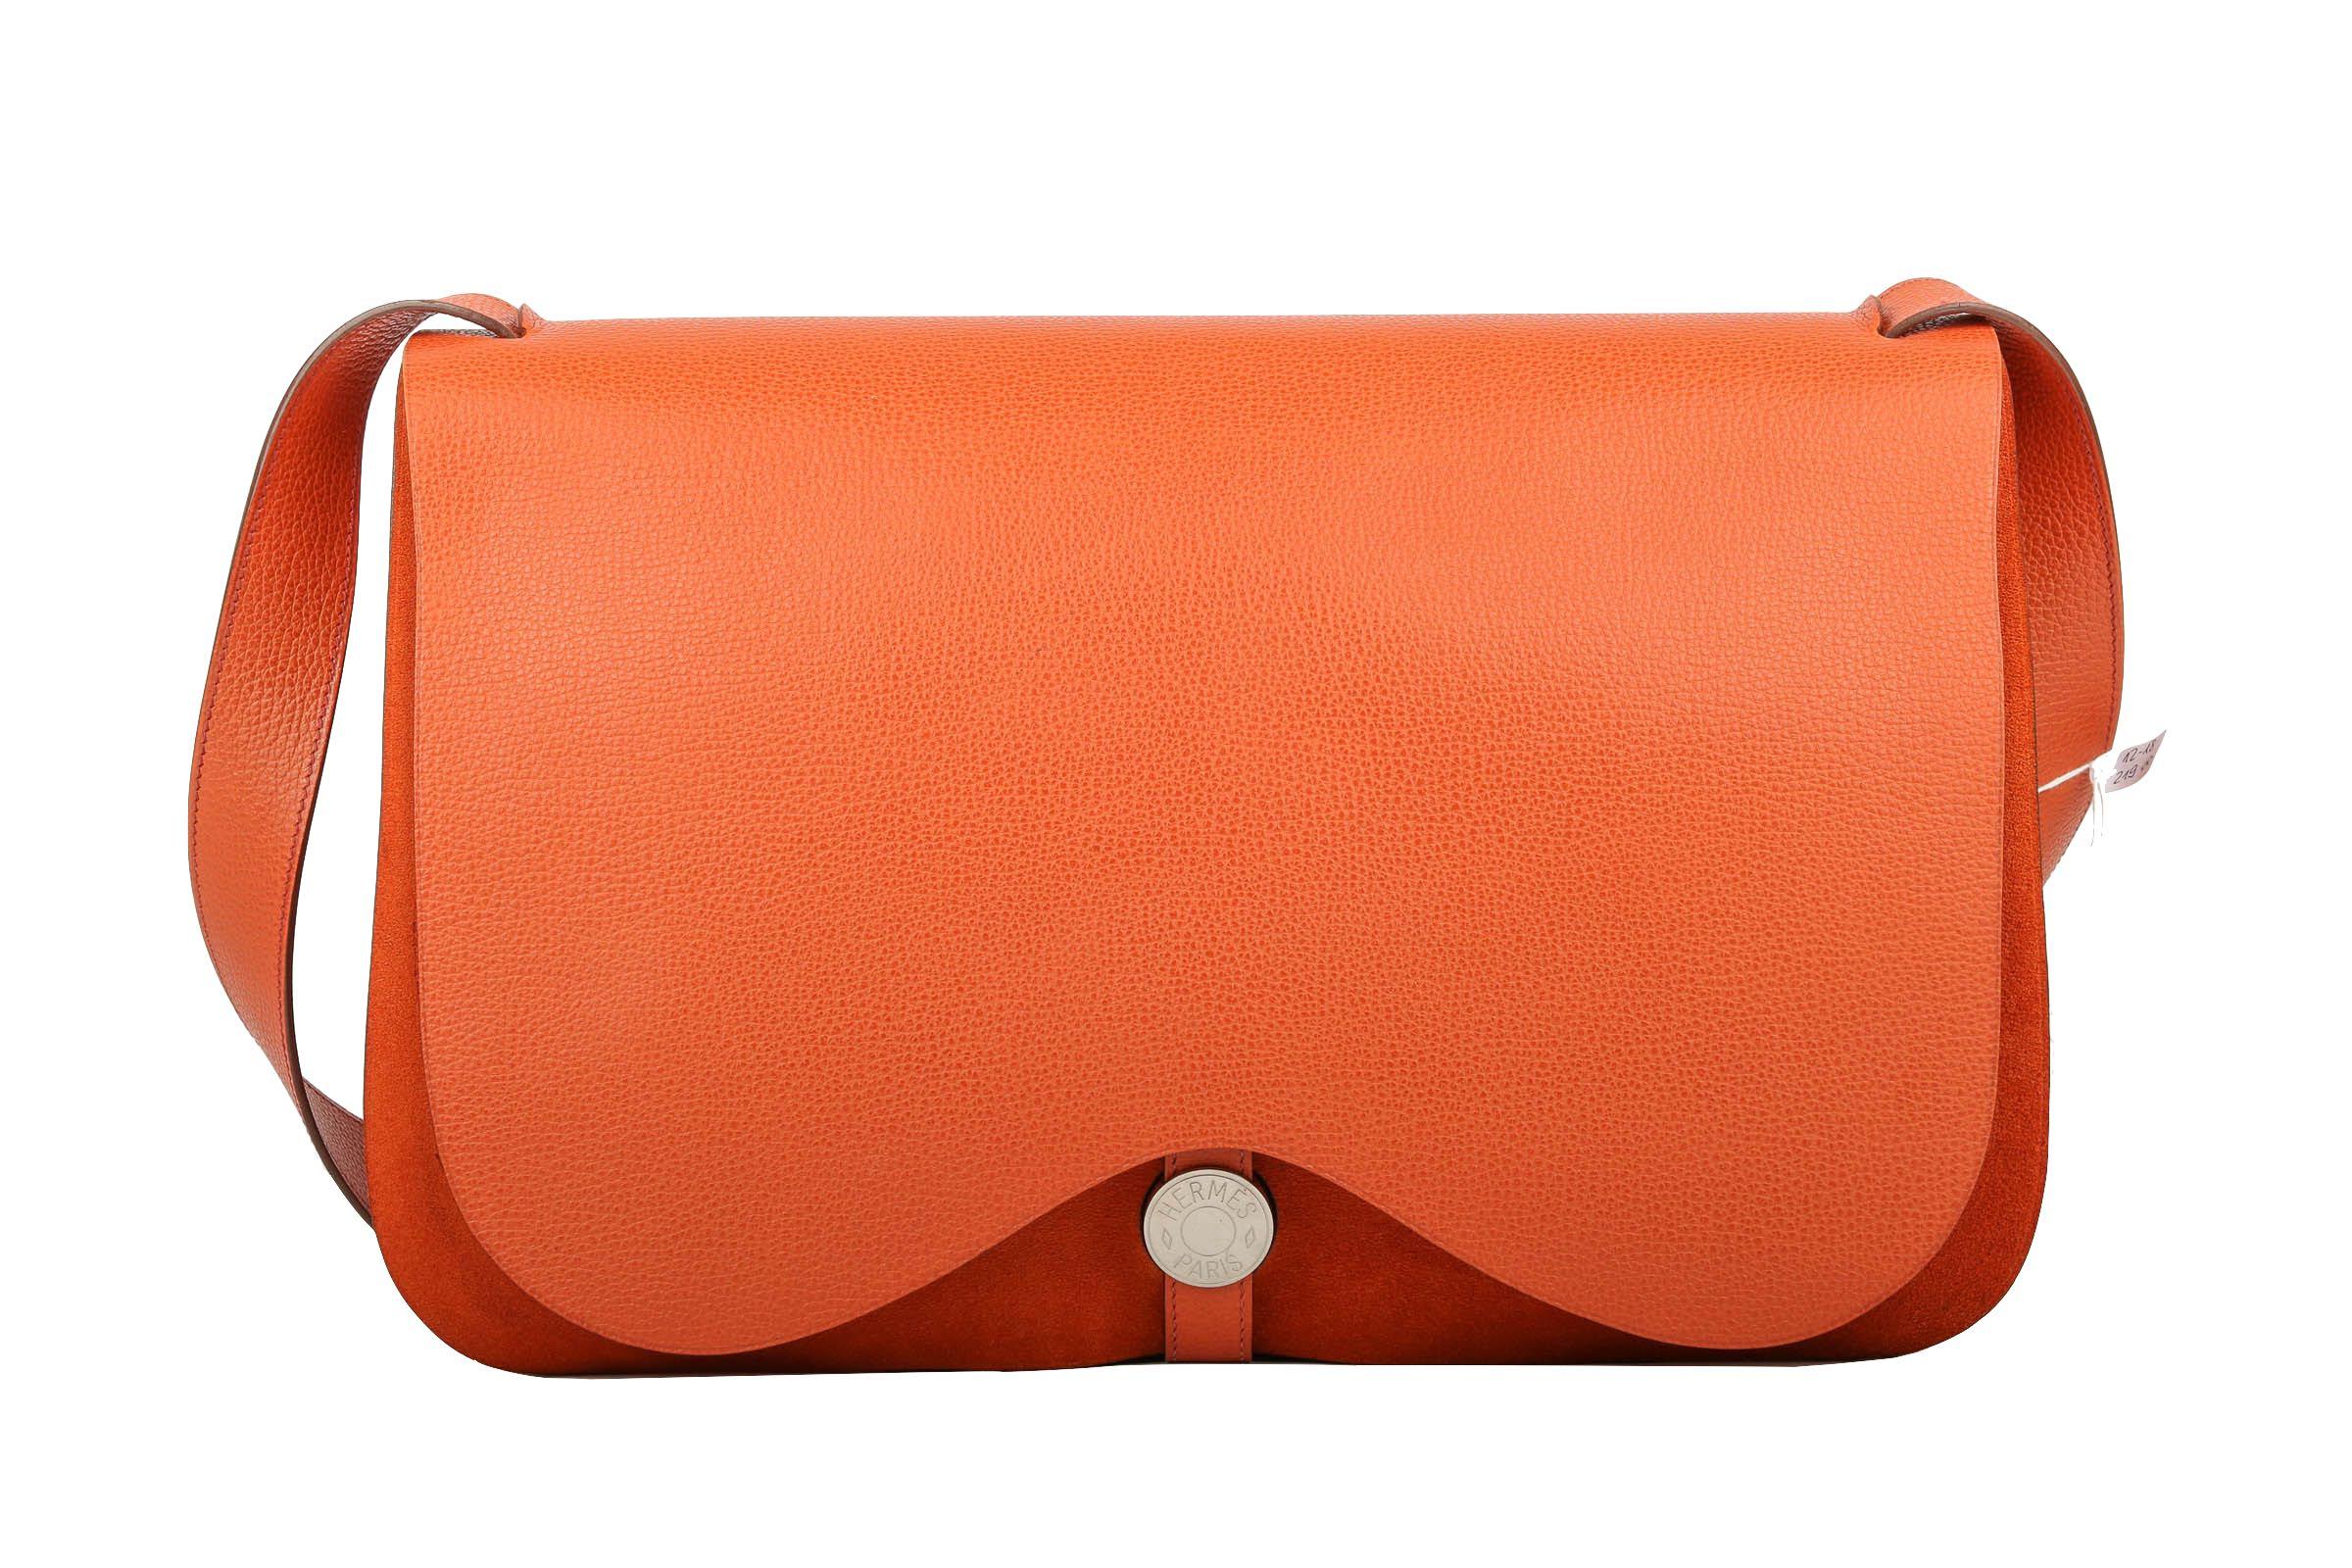 Hermes Paris Handtaschen Accessoires Luxussachen Com